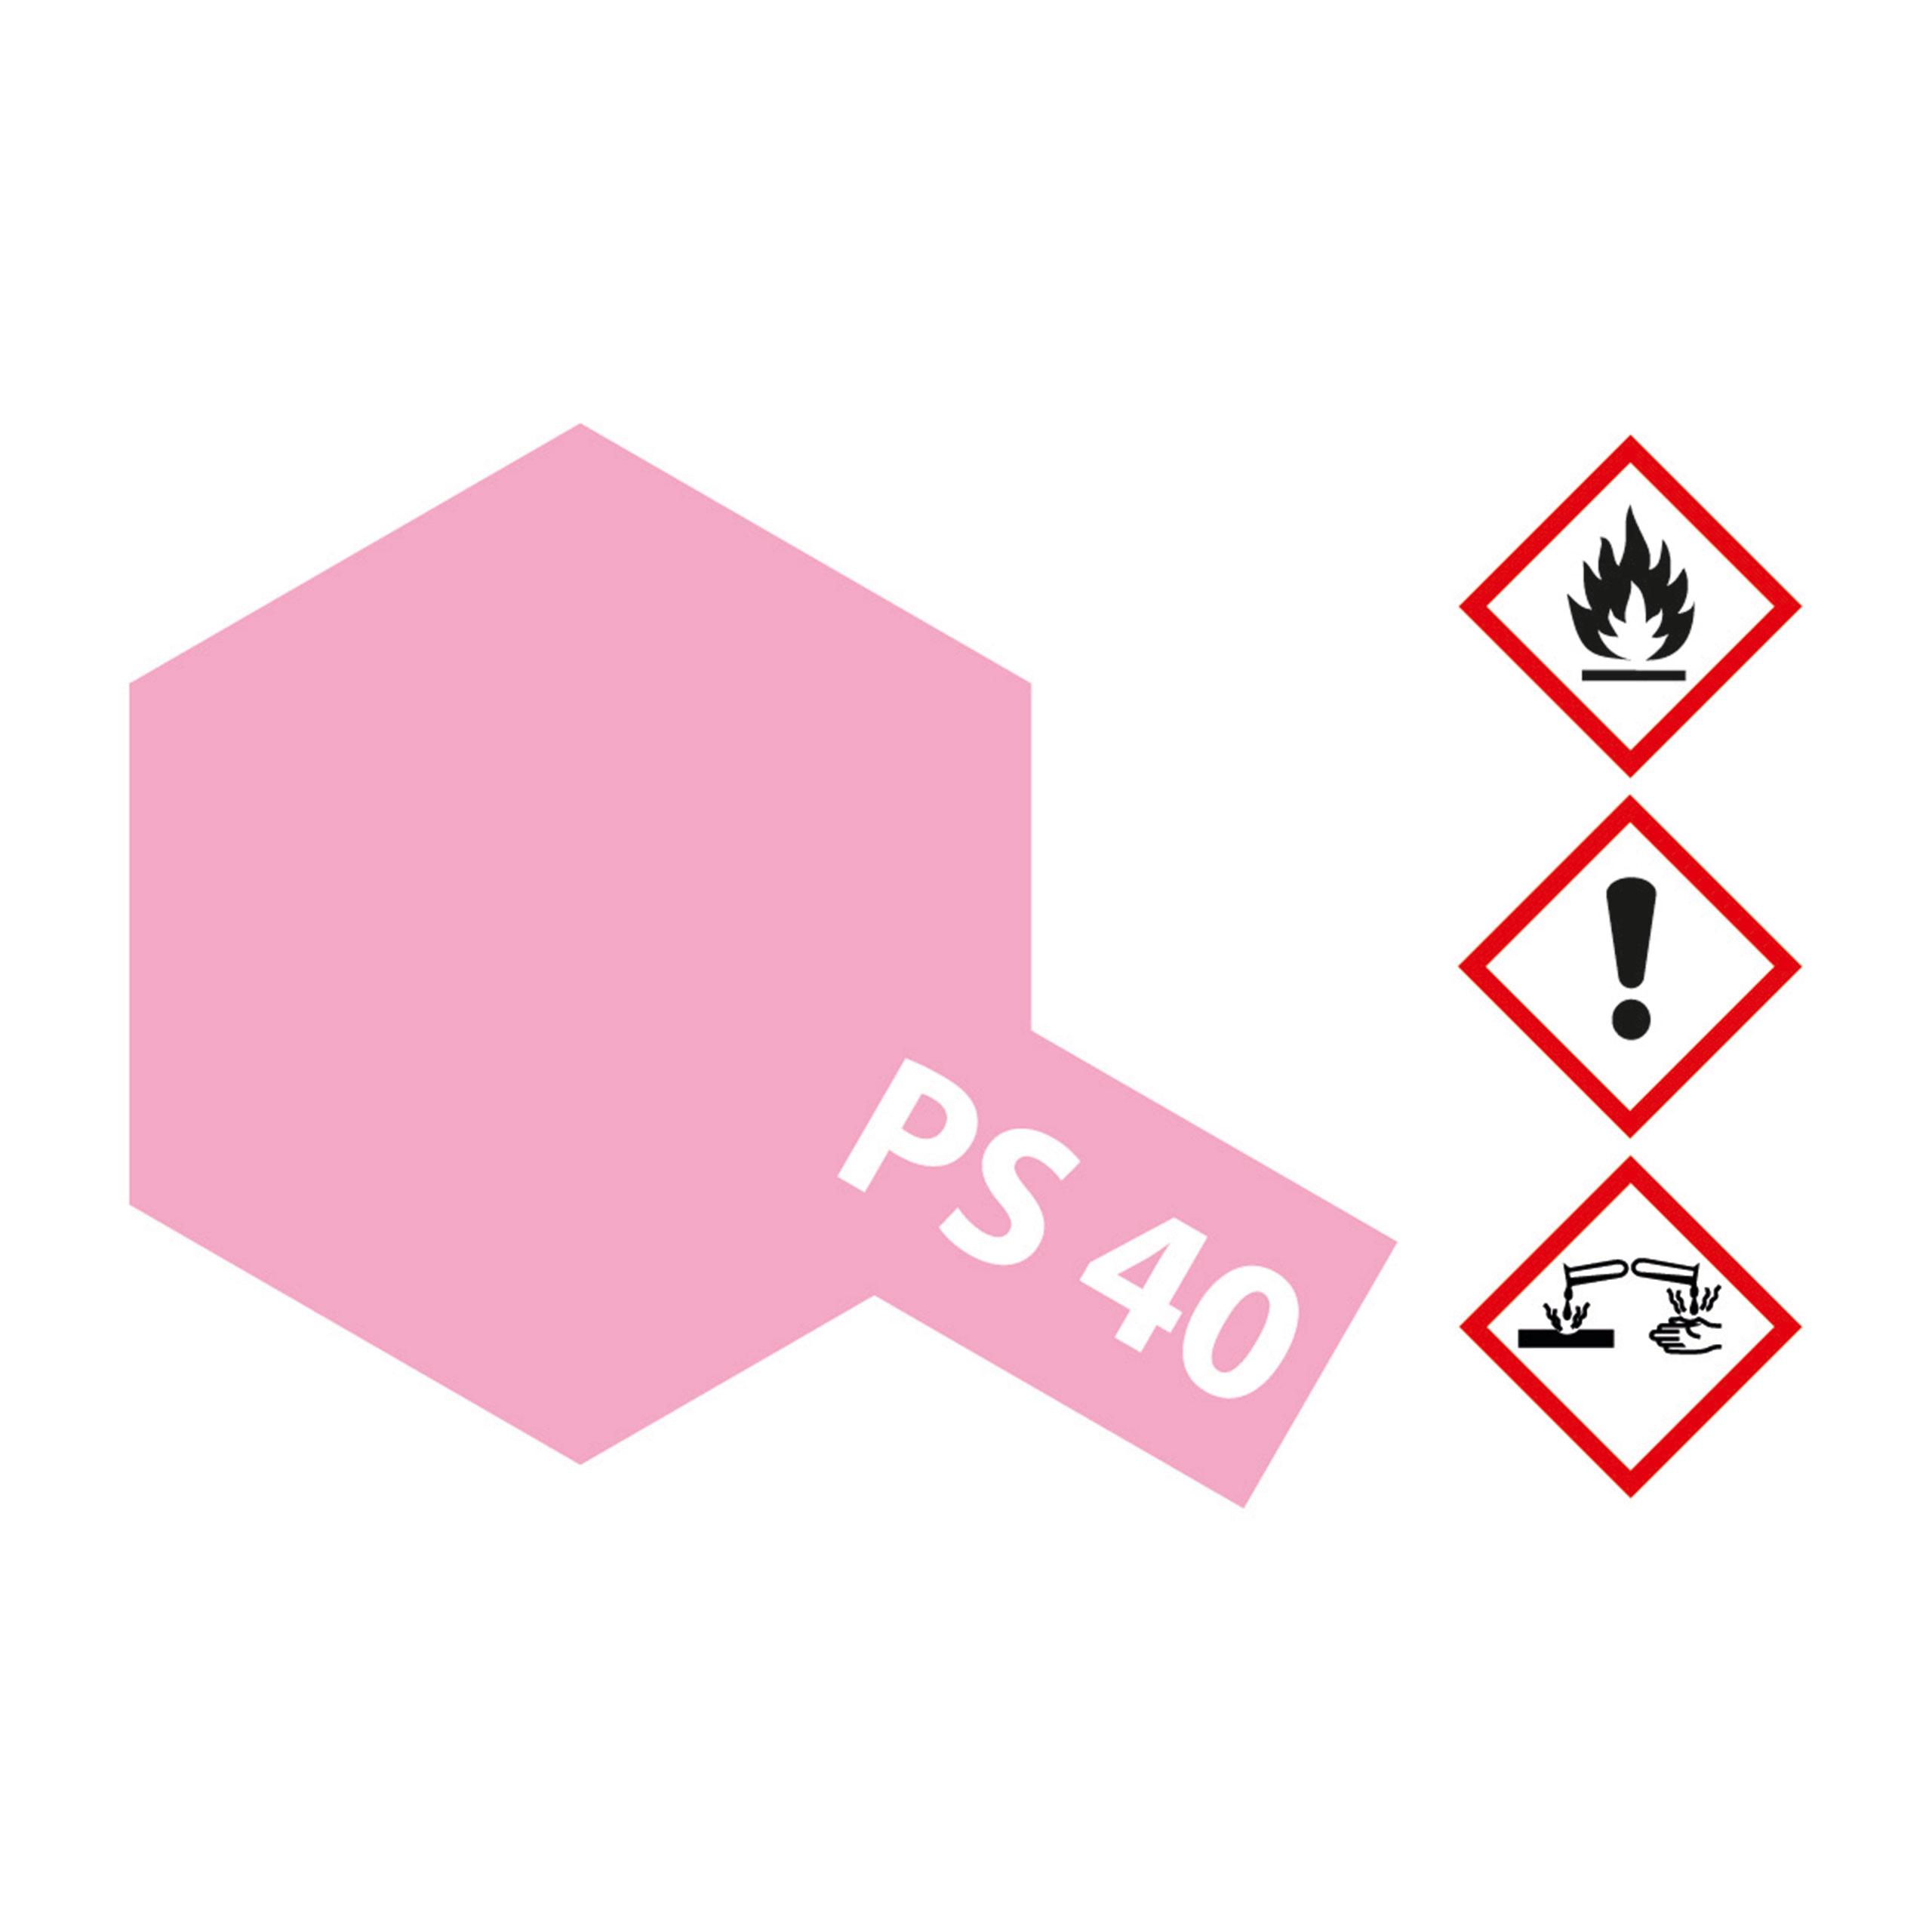 PS-40 Translucent Rosarot Polyc. - 100ml Sprayfarbe Lexan - Tamiya 300086040